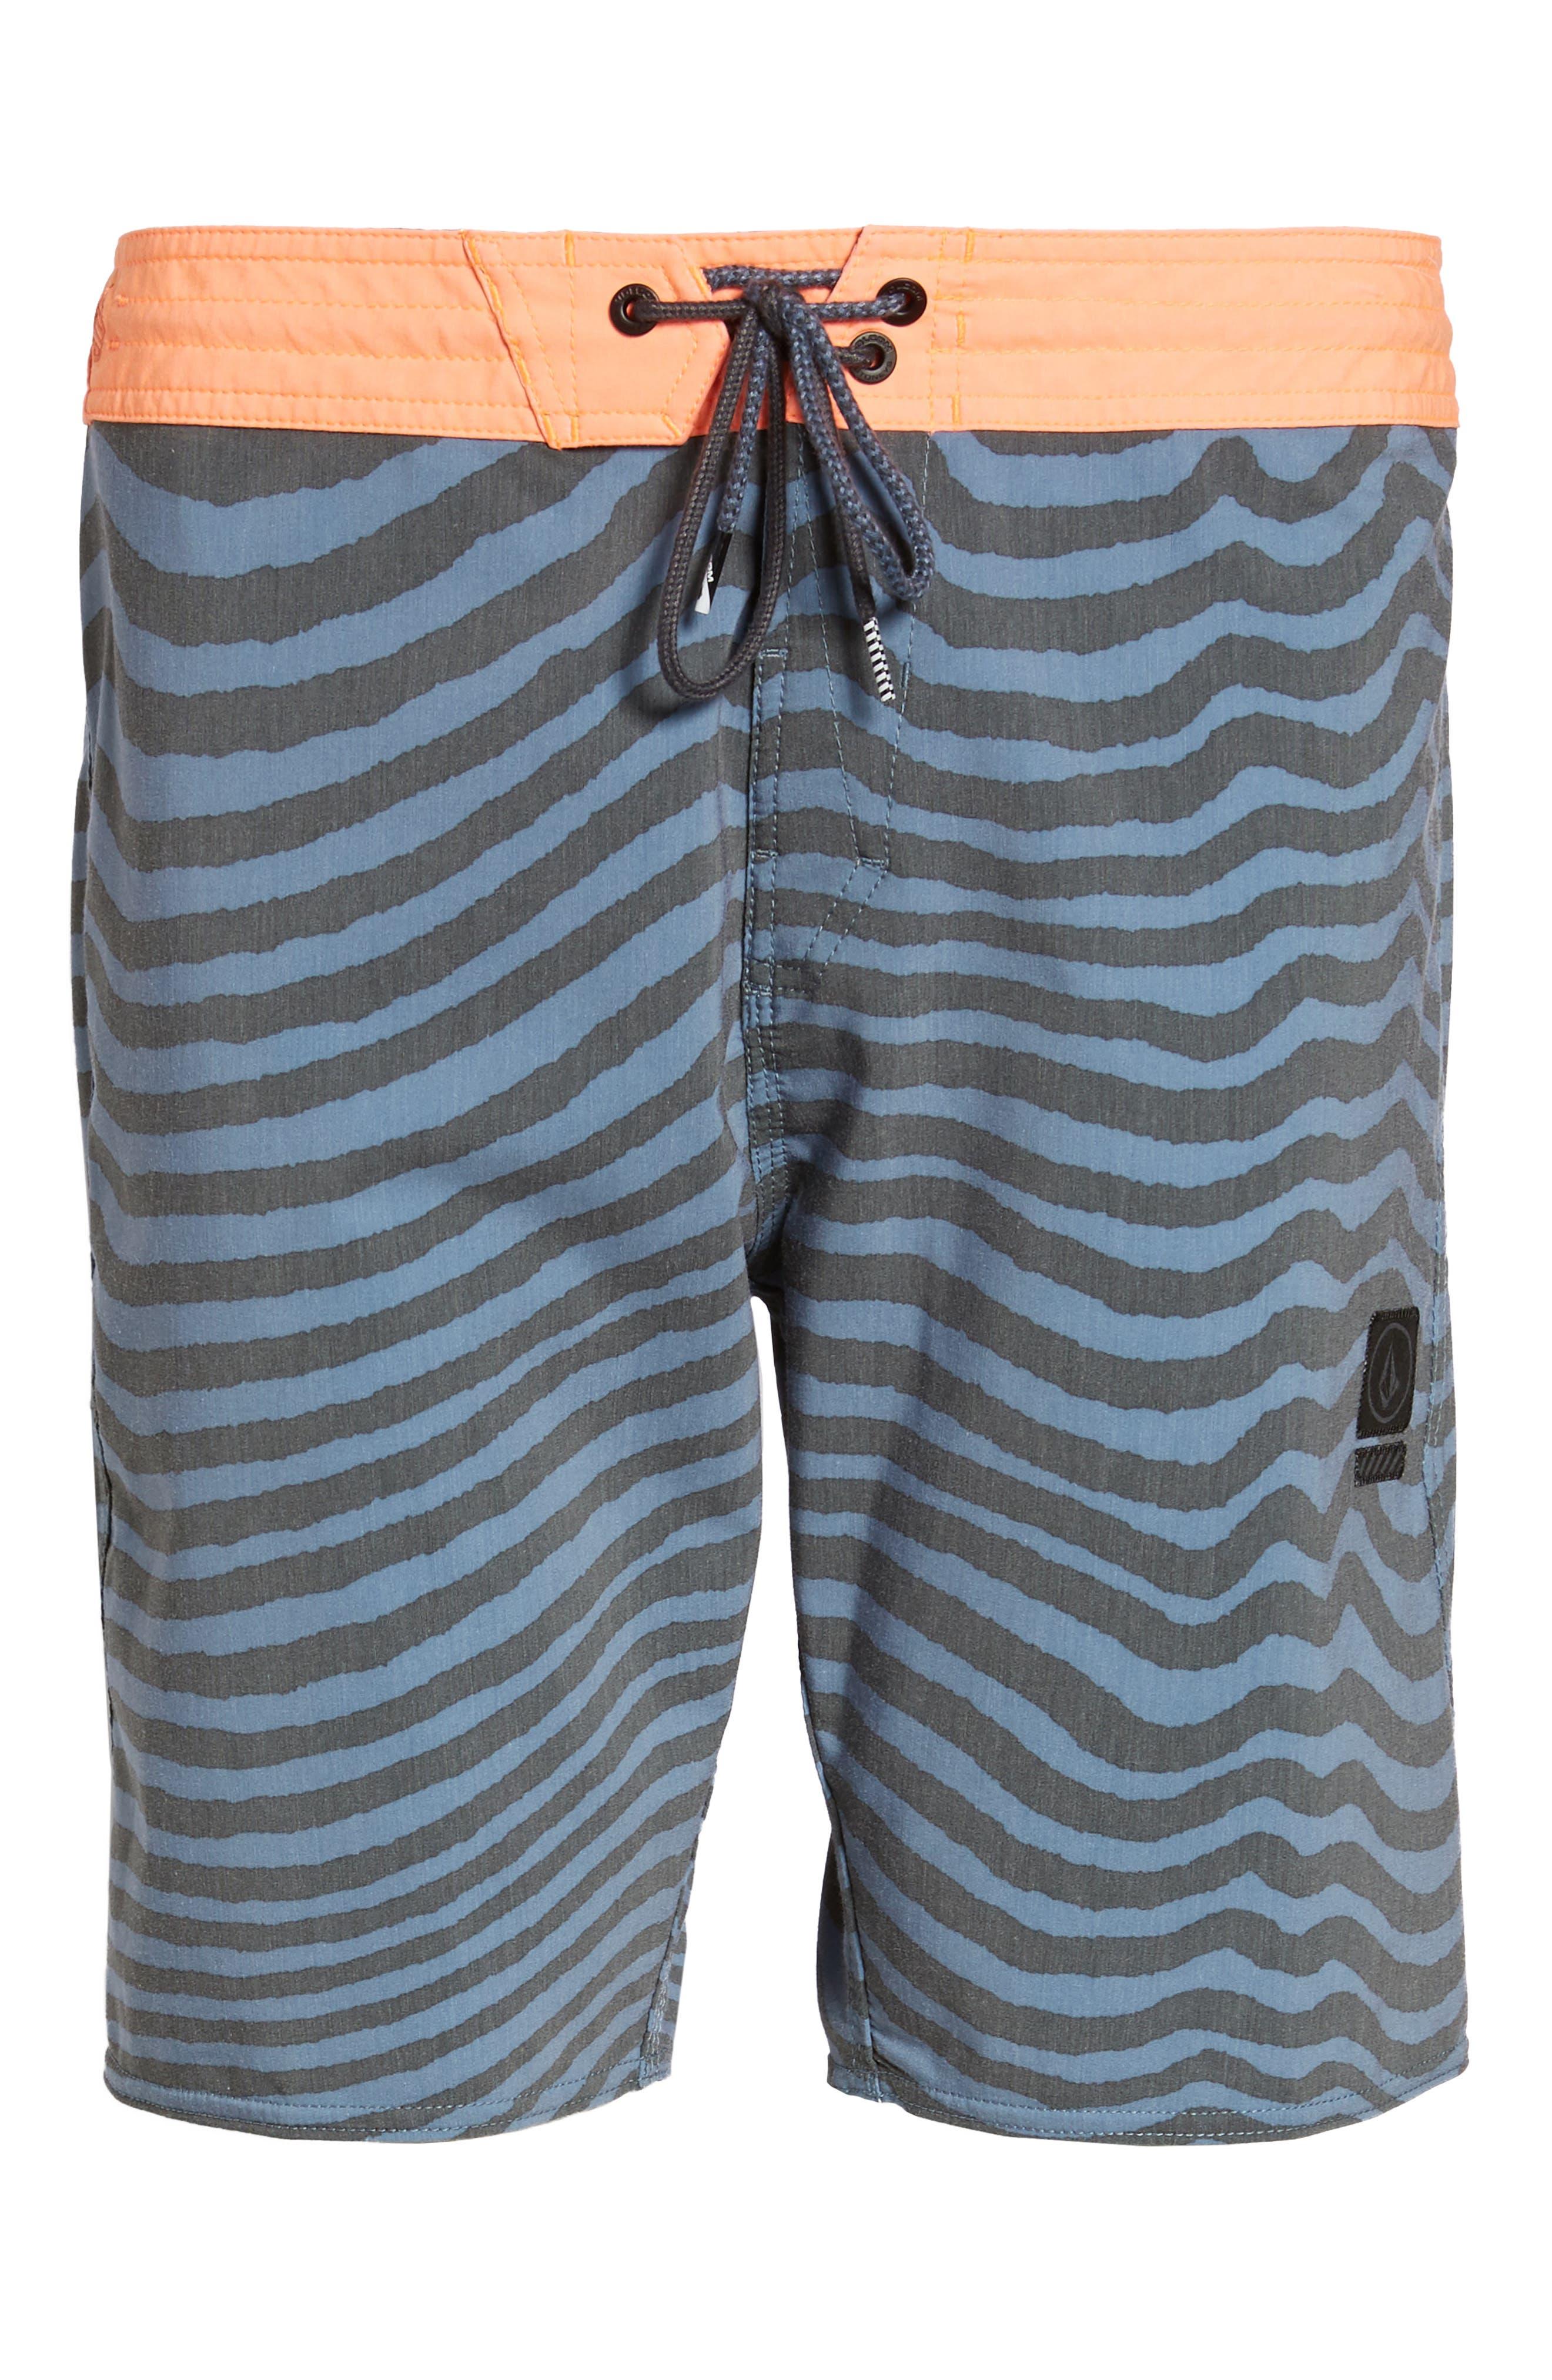 Stripey Slinger Board Shorts,                             Alternate thumbnail 41, color,